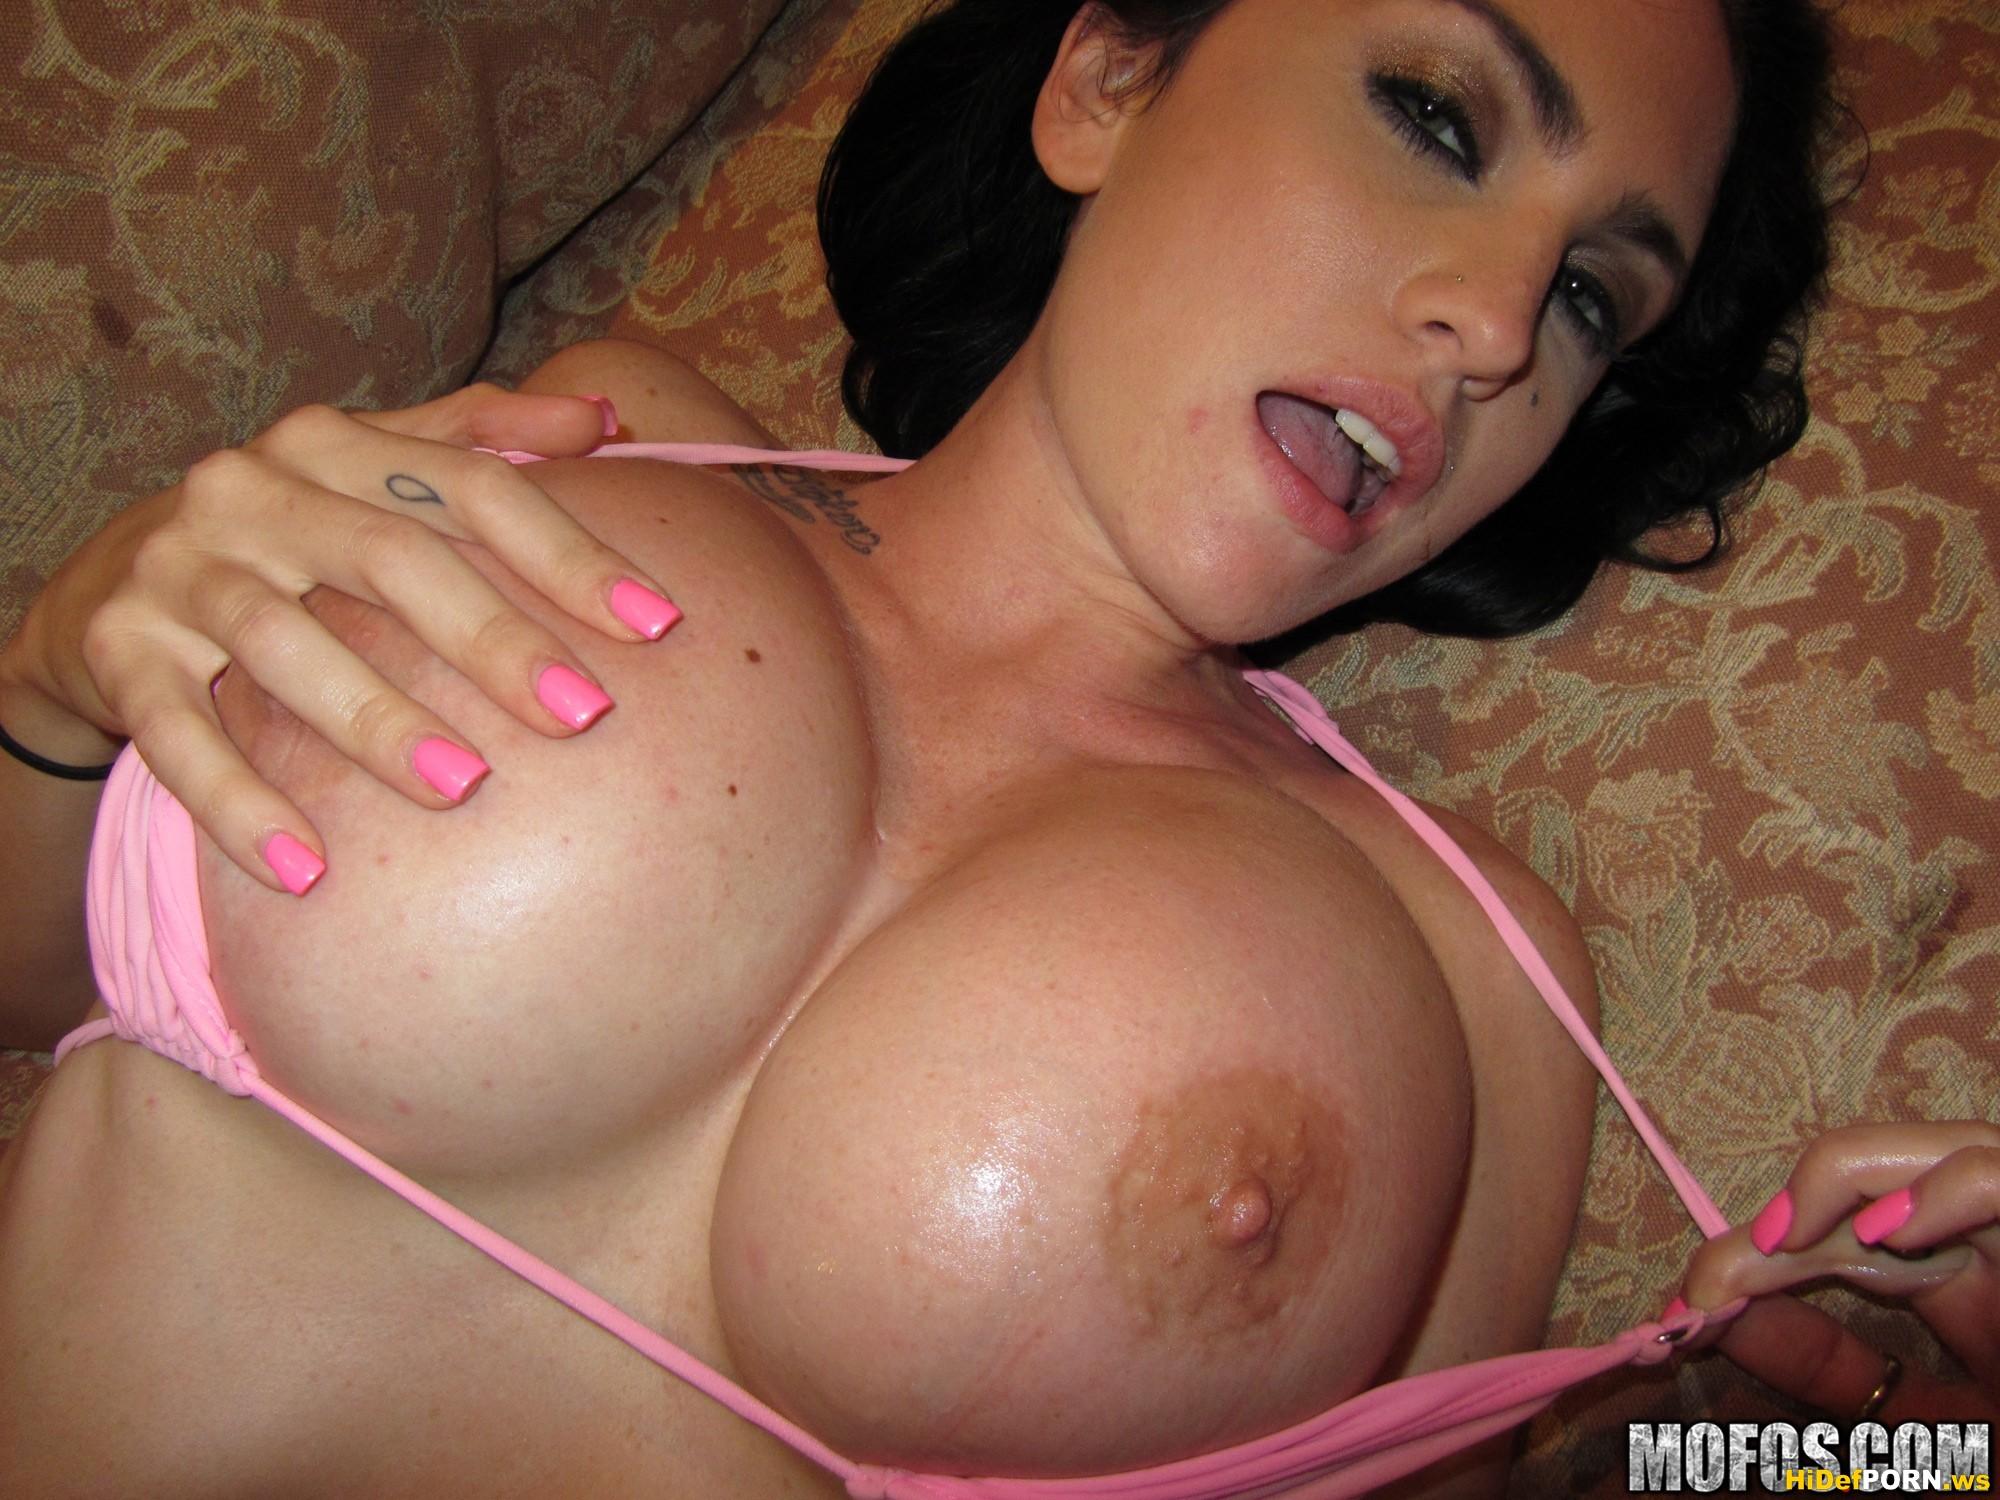 Порно актриса эммануэль лондон смотреть онлайн фото 425-966